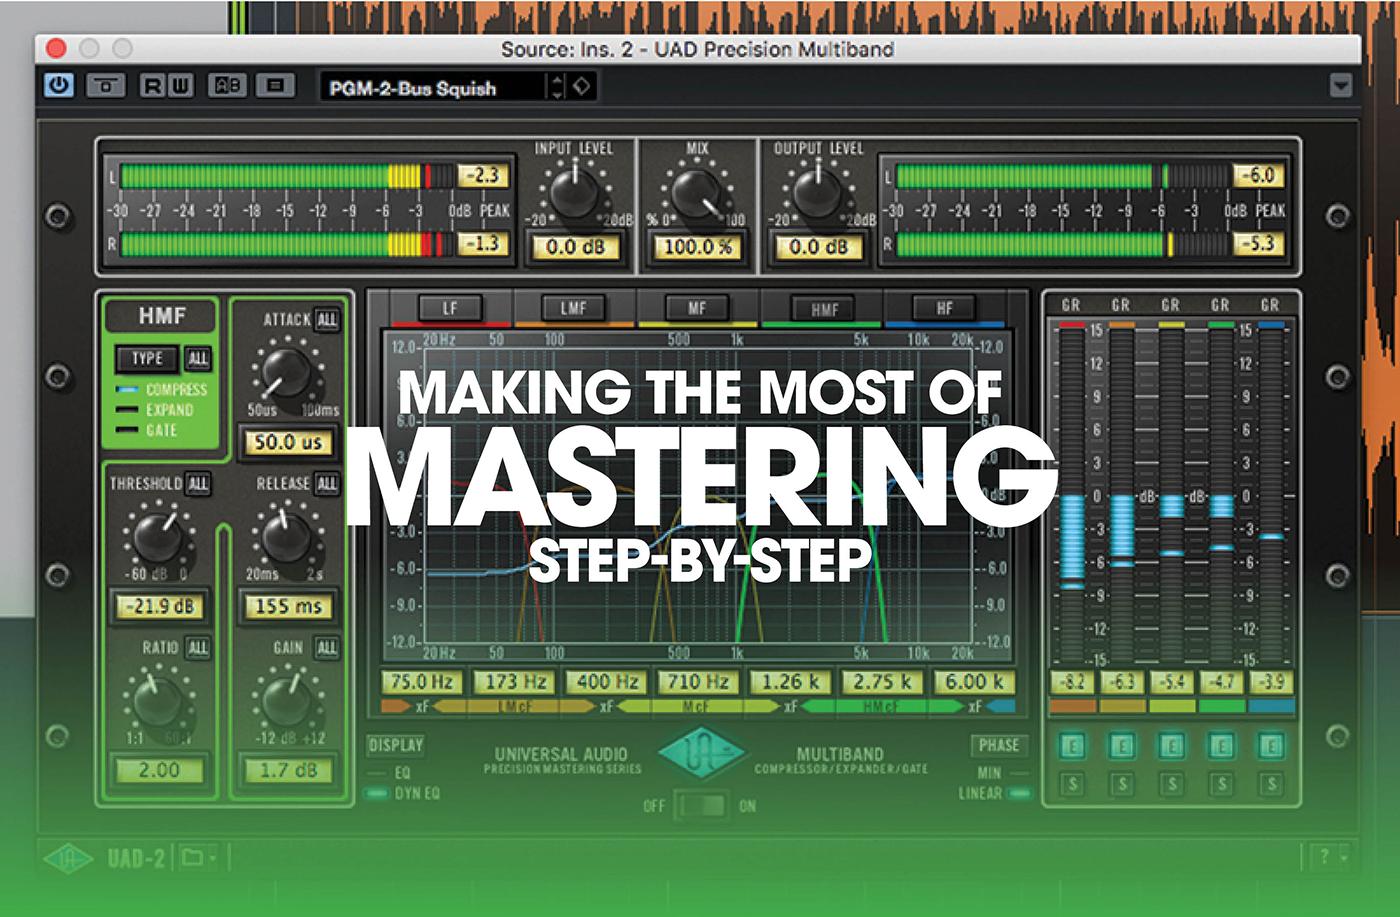 Mastering Tutorial, step-by-step